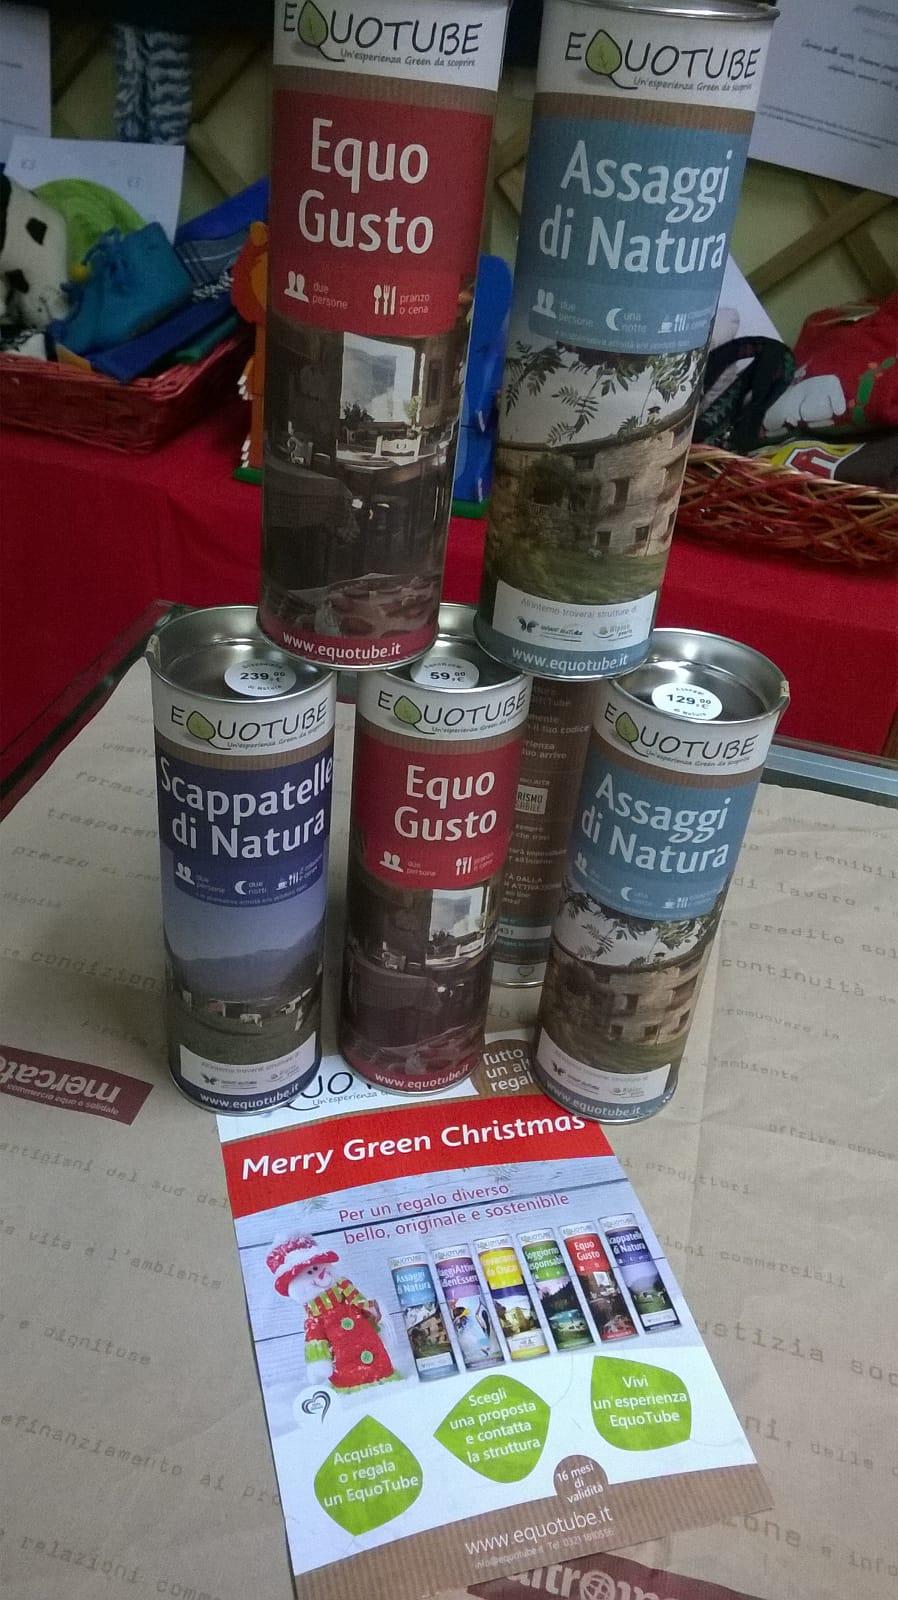 Natale regalo equosolidale3